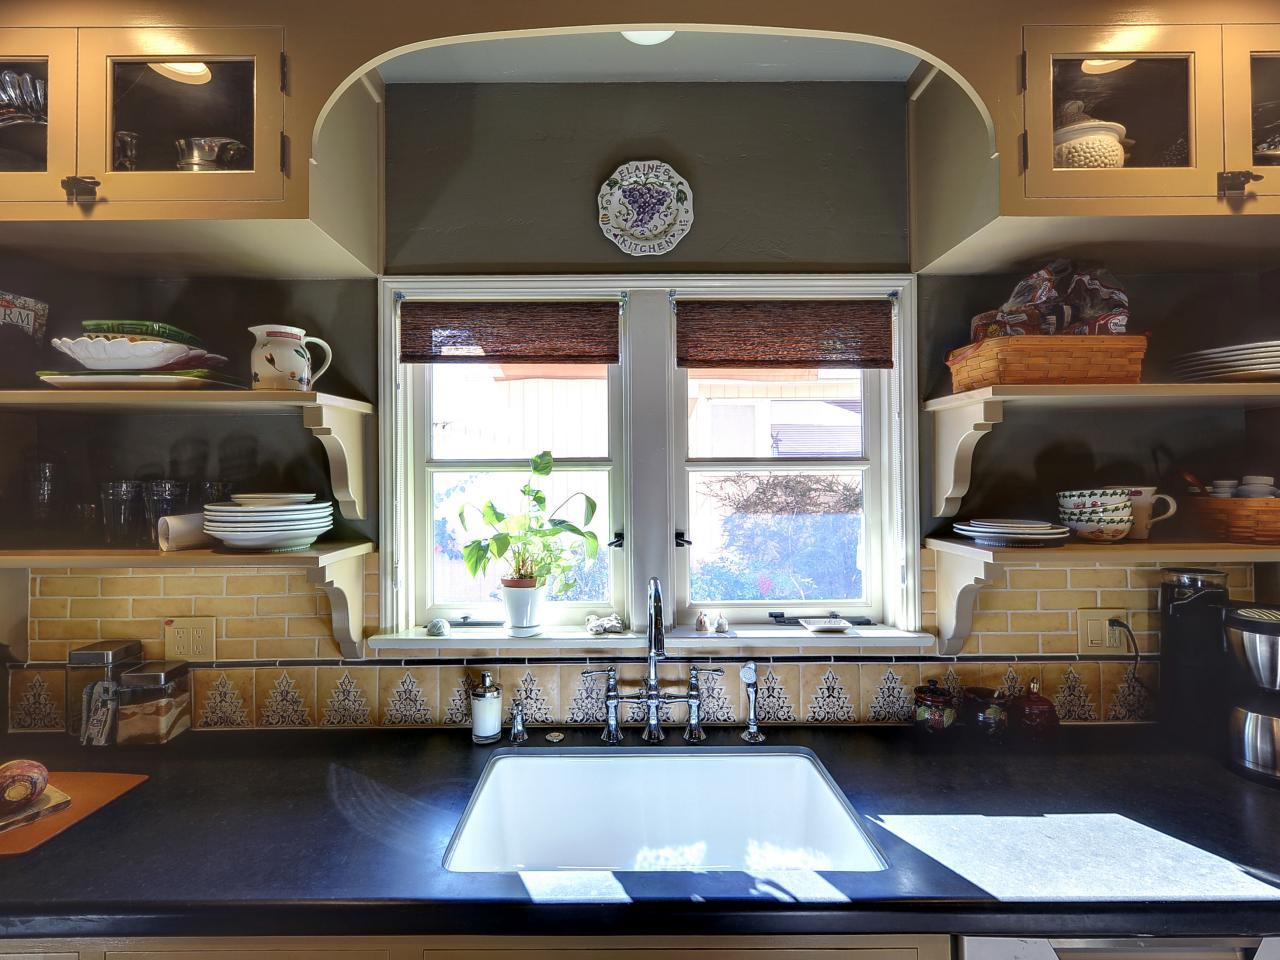 Moroccan Style Kitchen Tiles Stylish Moroccan Galley Kitchen Melissa Salamoff Hgtv